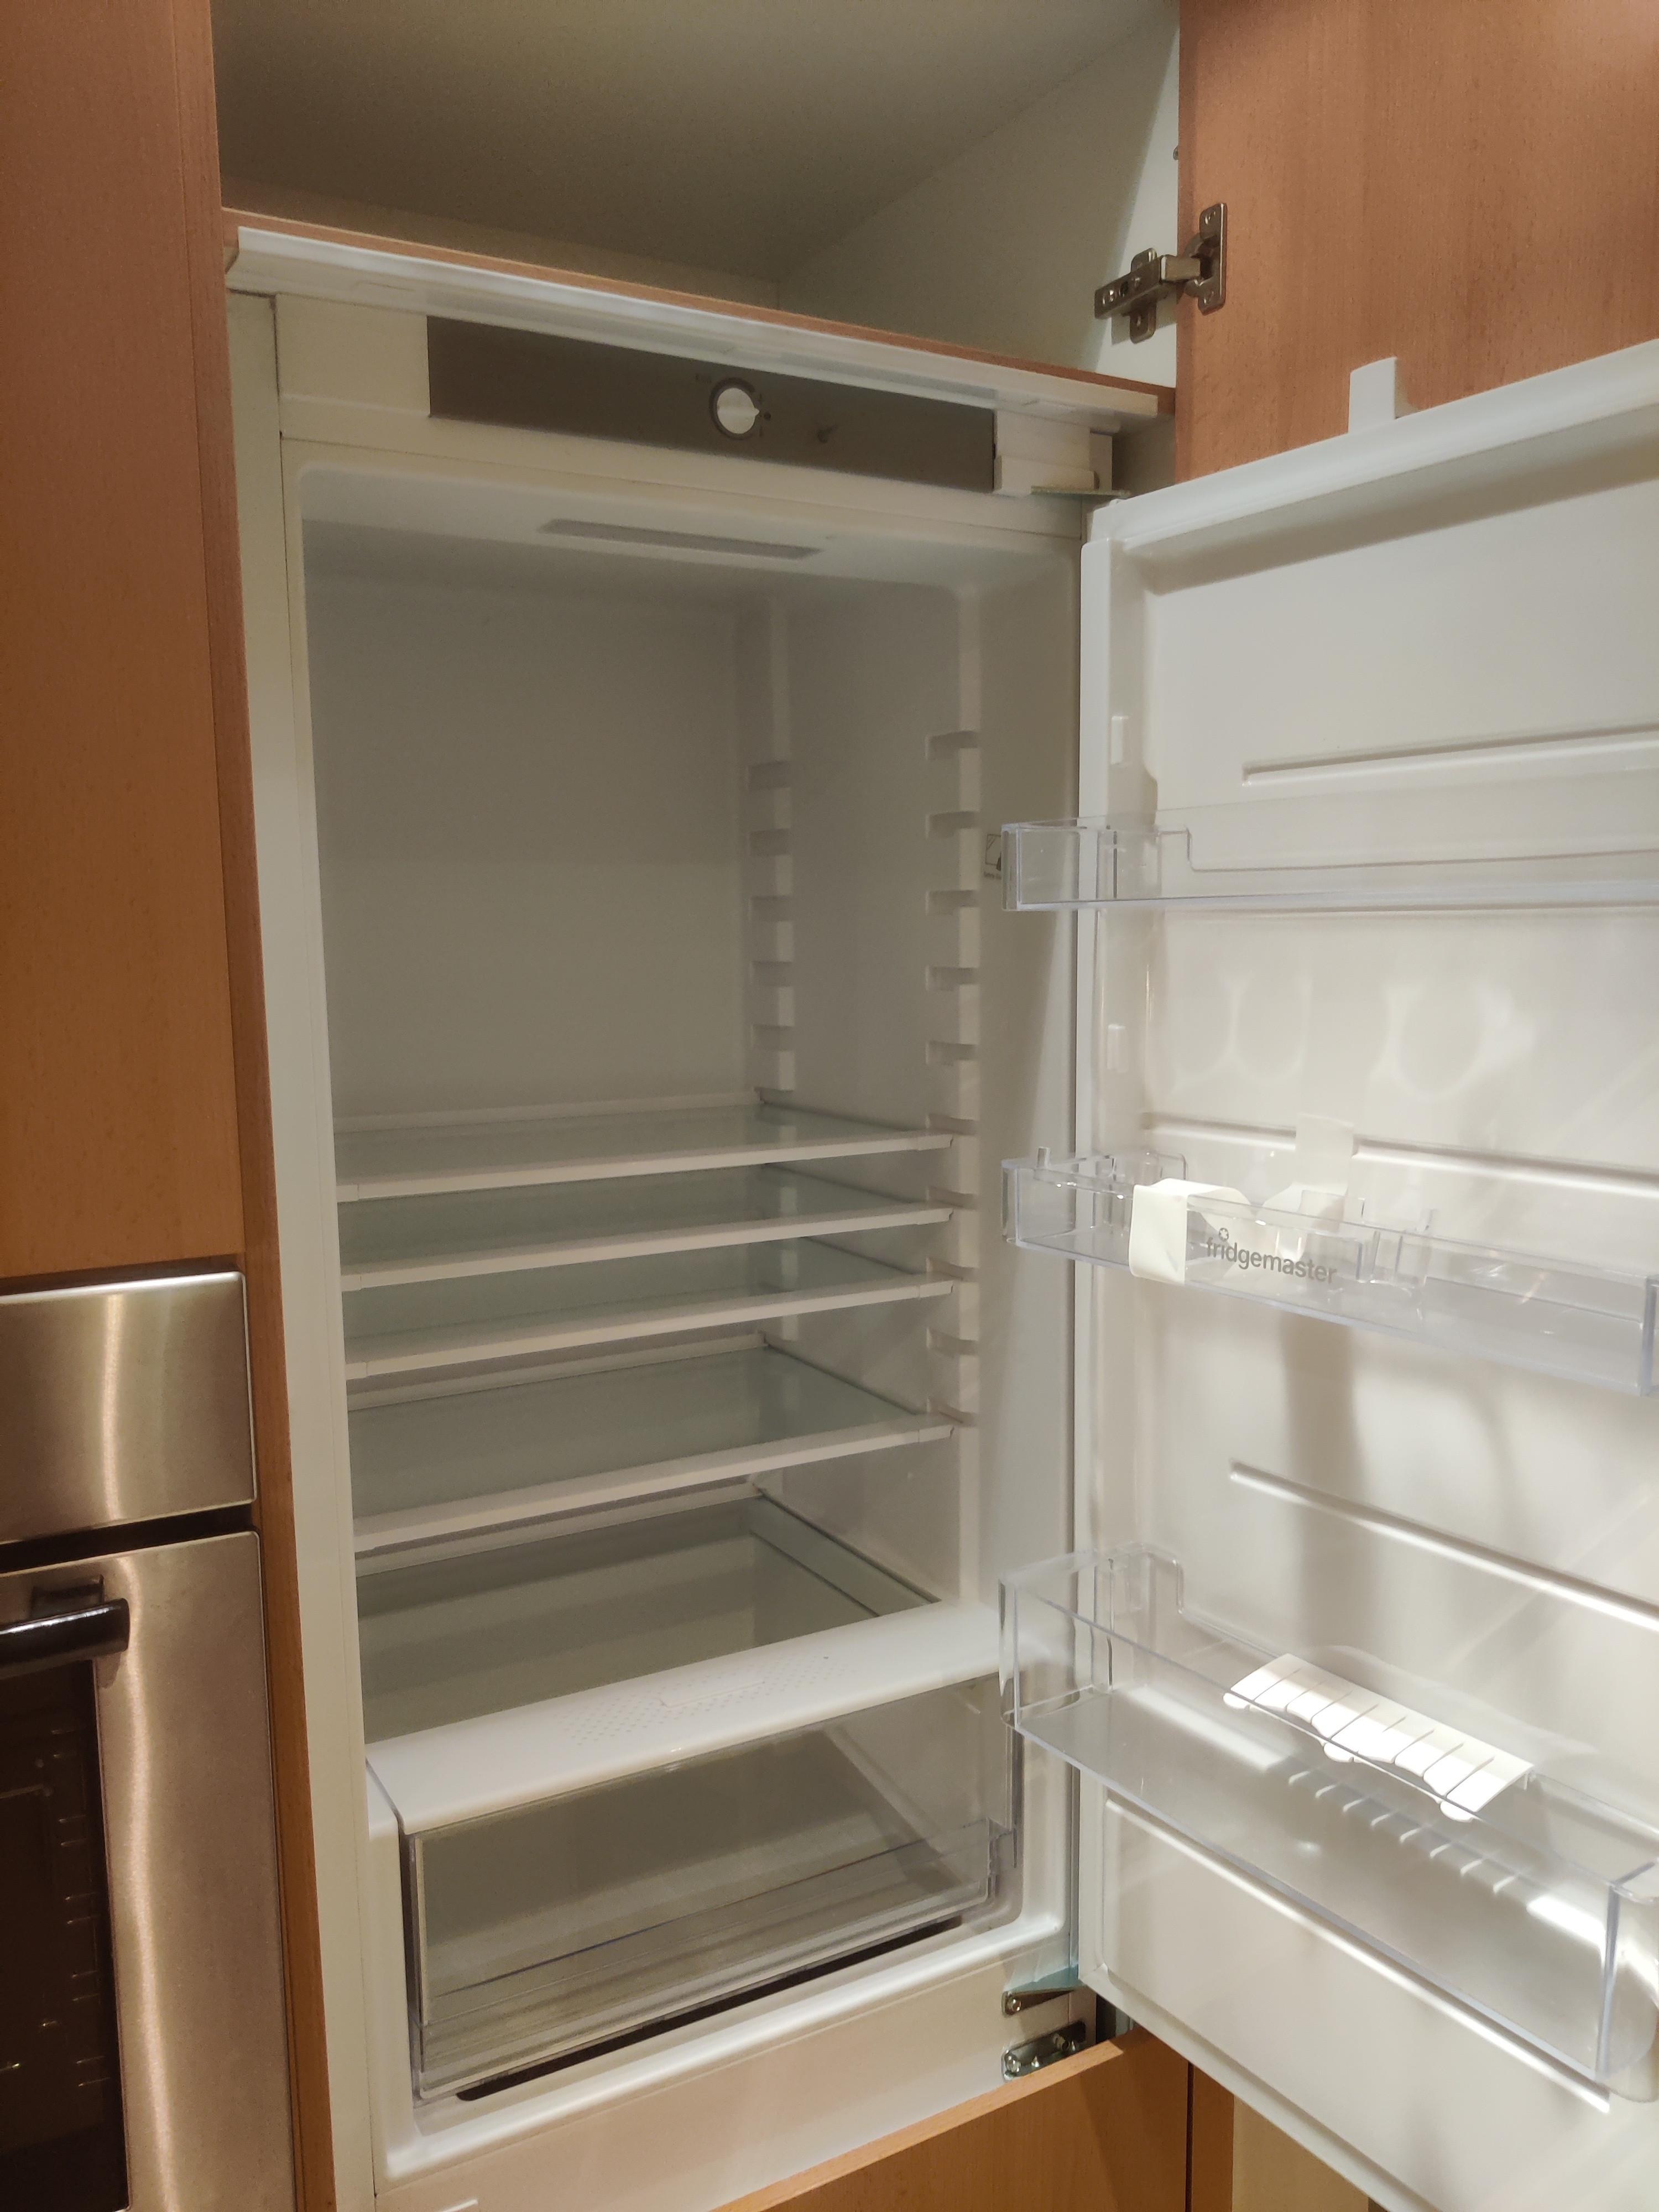 Fridge Freezer Installation